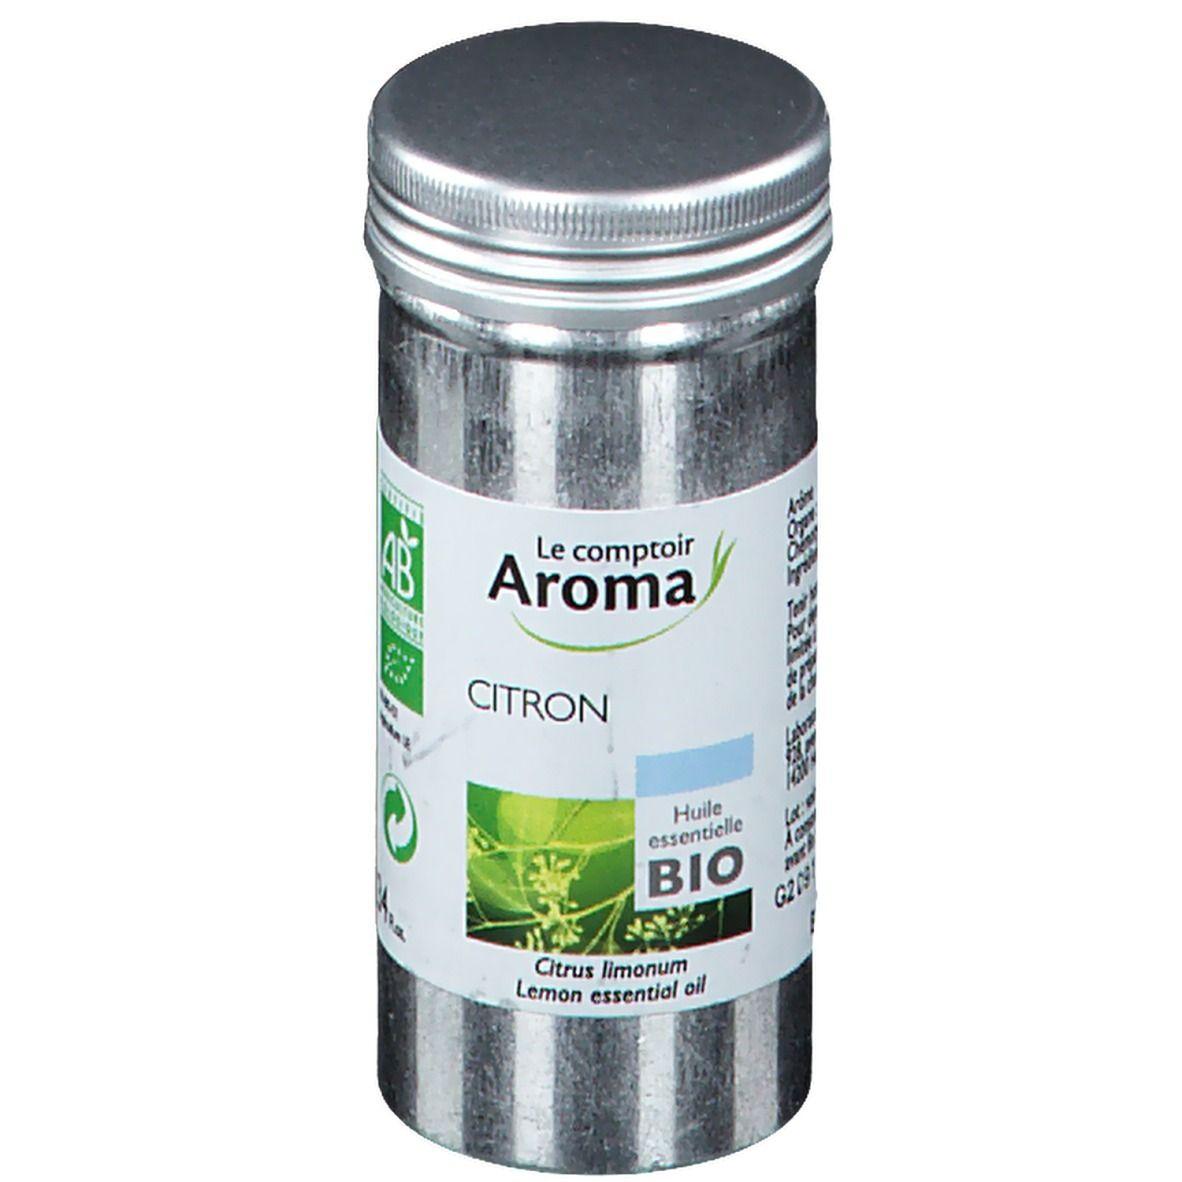 Le Comptoir Aroma huile essentielle bio citron ml huile